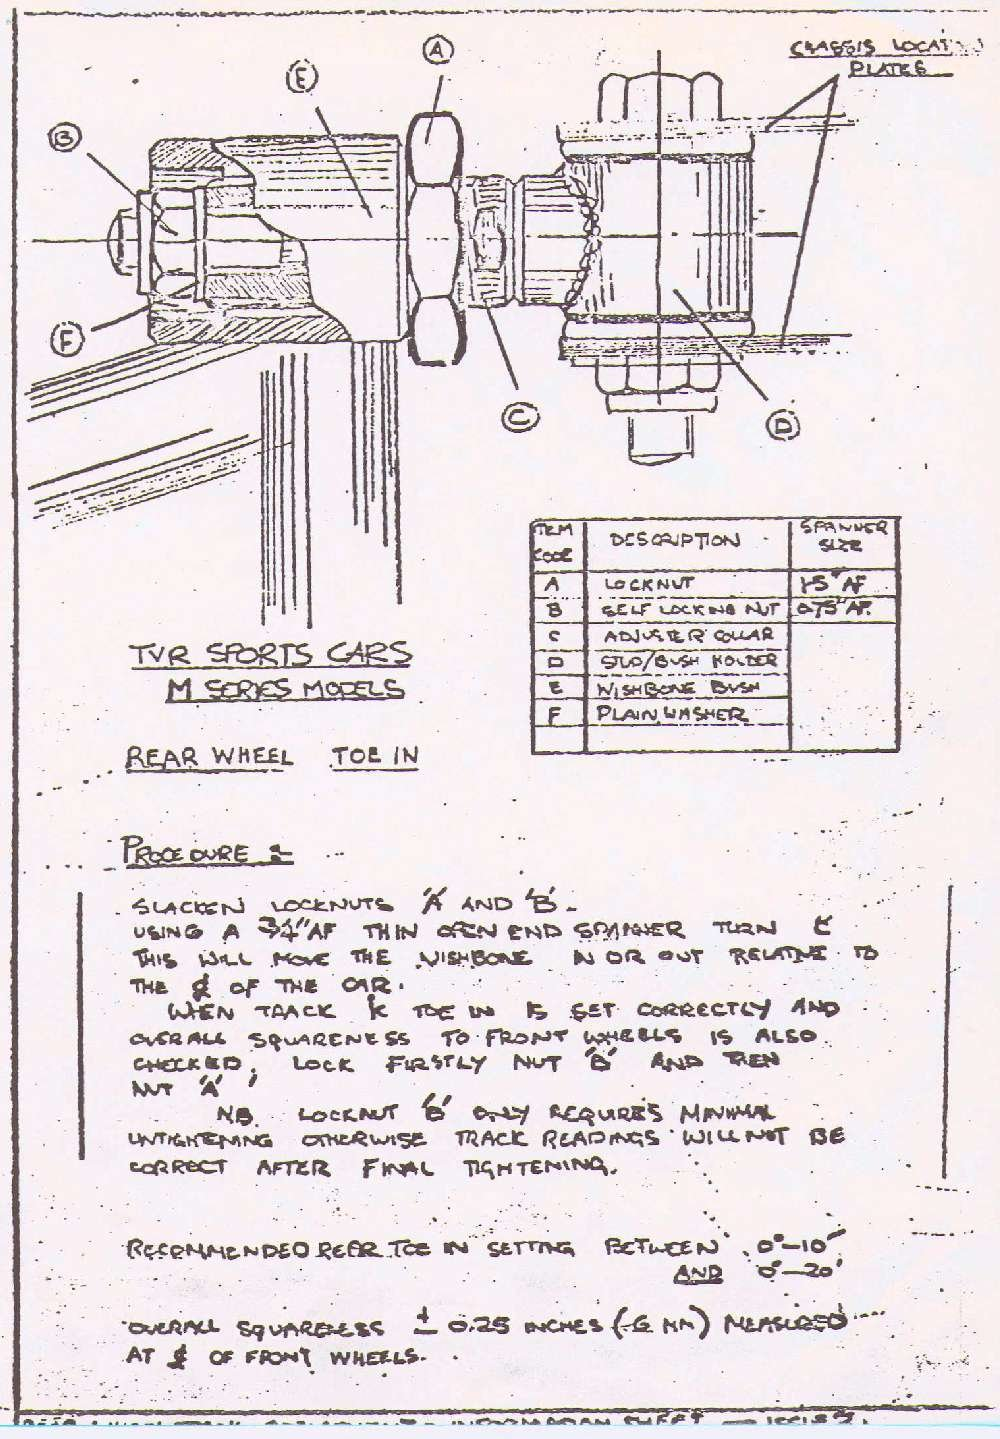 wiring diagram tvr taimar